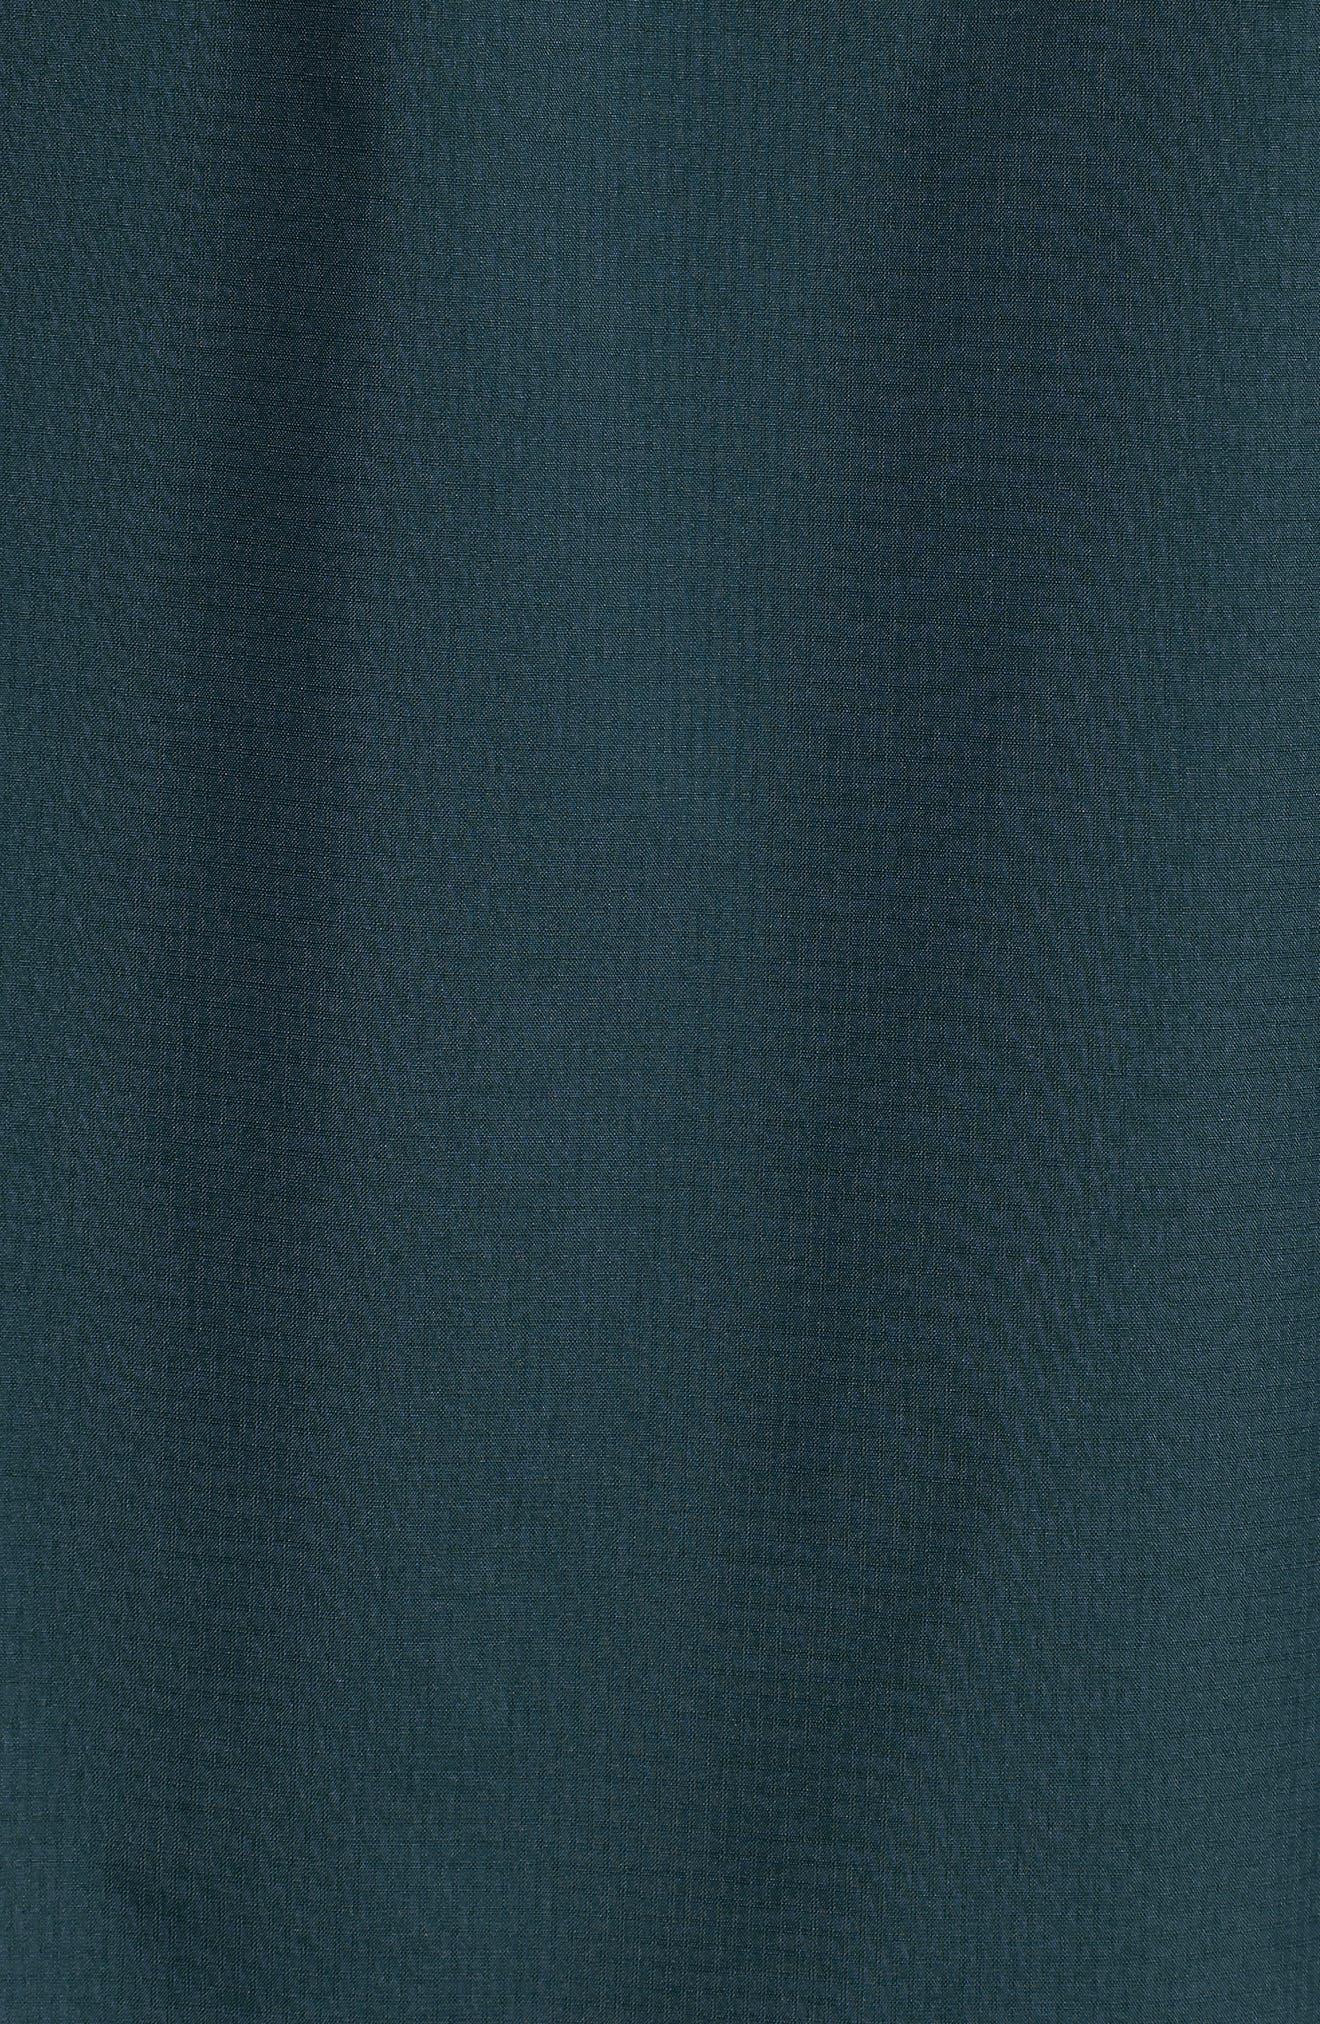 THE NORTH FACE,                             Venture II Raincoat,                             Alternate thumbnail 7, color,                             KODIAK BLUE/ KODIAK BLUE